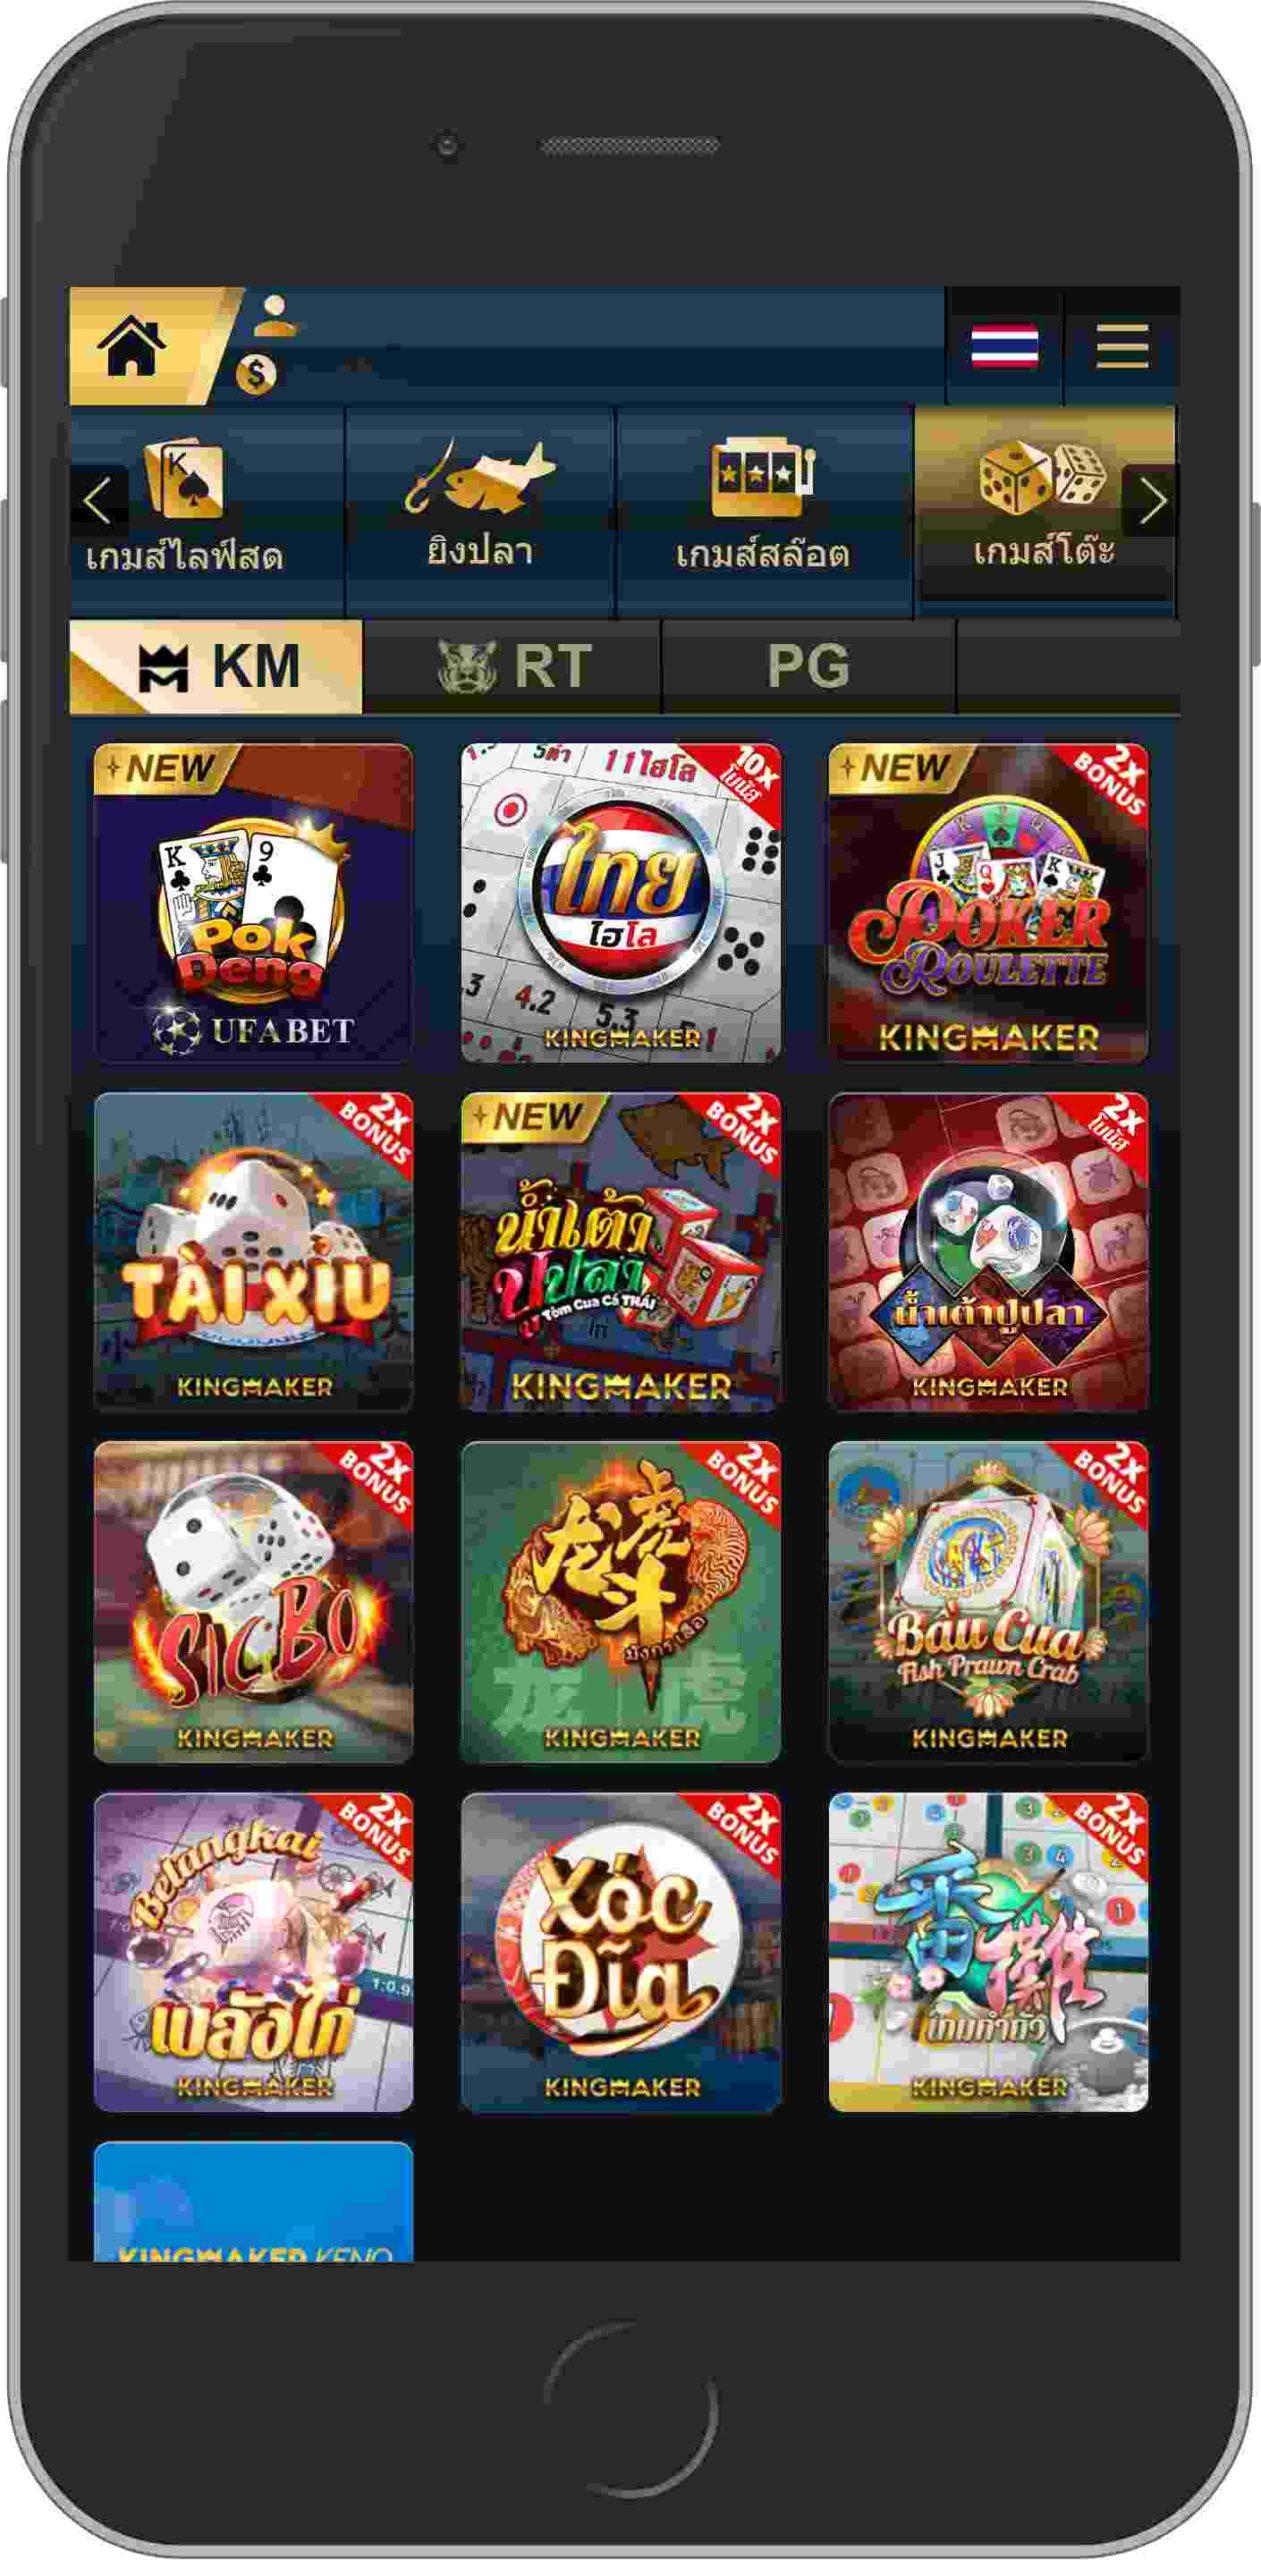 Kingmaker ค่ายเกมน่าเล่นจาก UFAGame.App